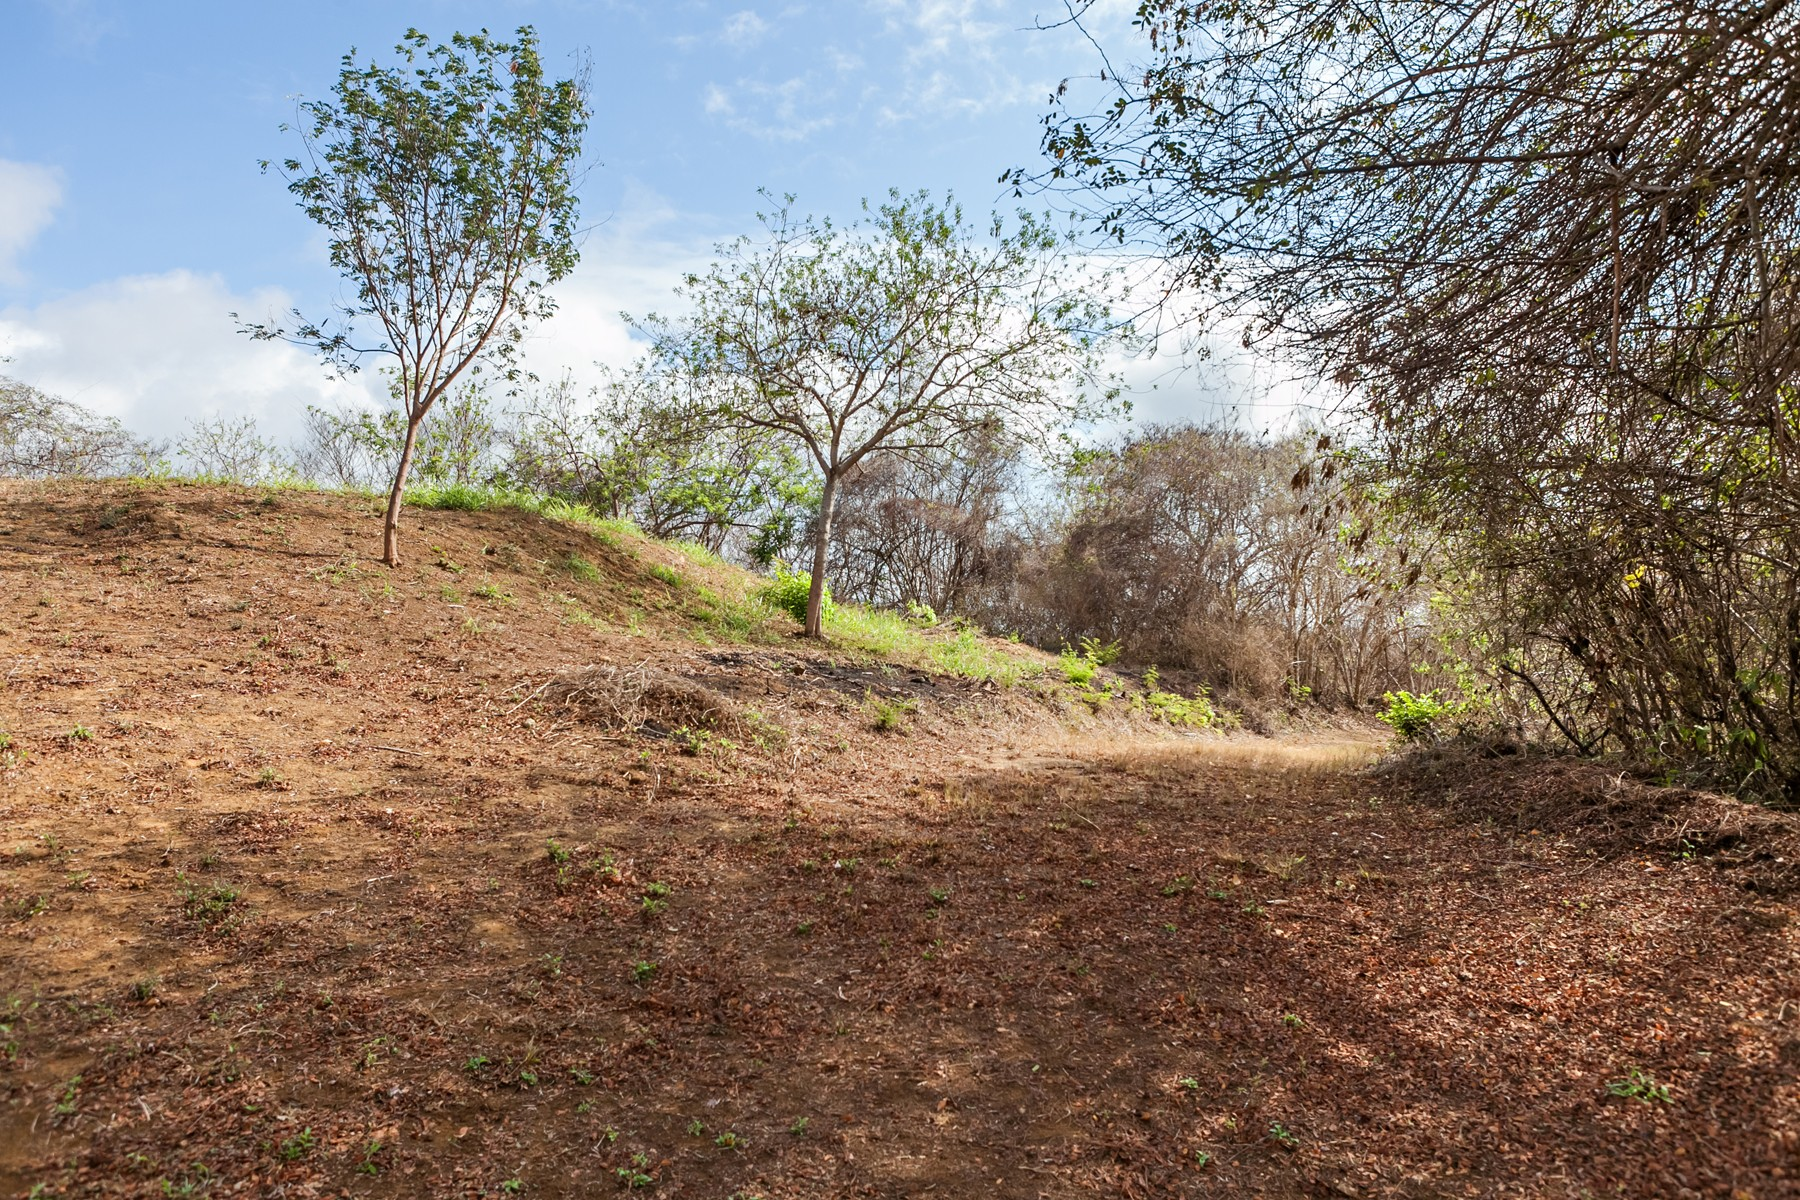 Additional photo for property listing at El Malinal Lot, Litibu, Punta Mita Litibu, Riviera Nayarit Punta De Mita, Nayarit 63734 Mexico